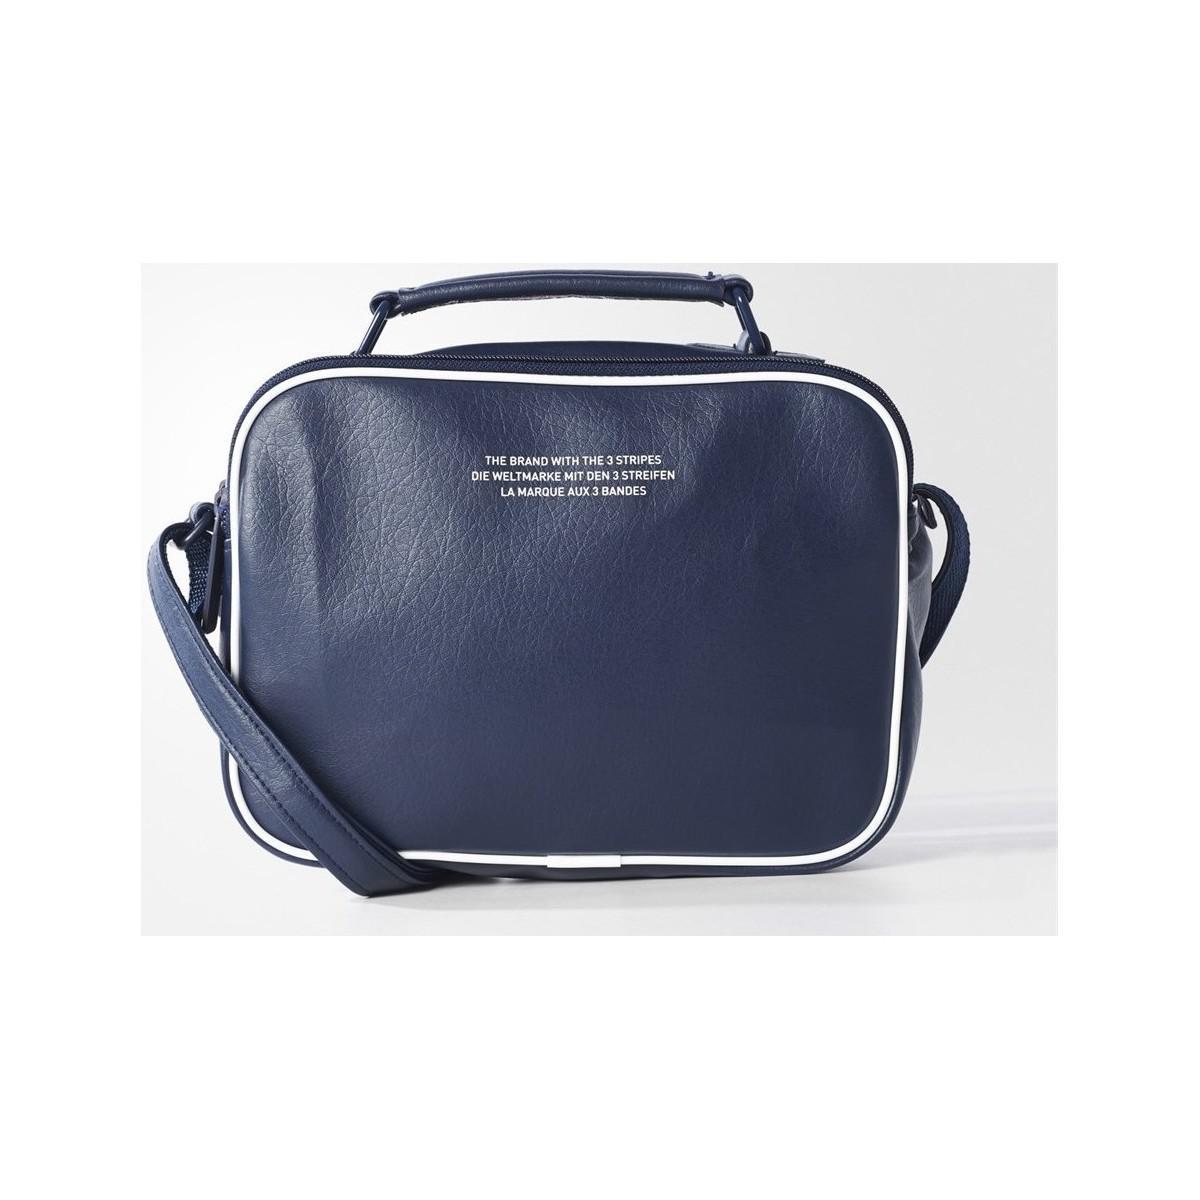 c20d6804ab adidas Originals Airliner Classic Bag Mini Men s Messenger Bag In ...